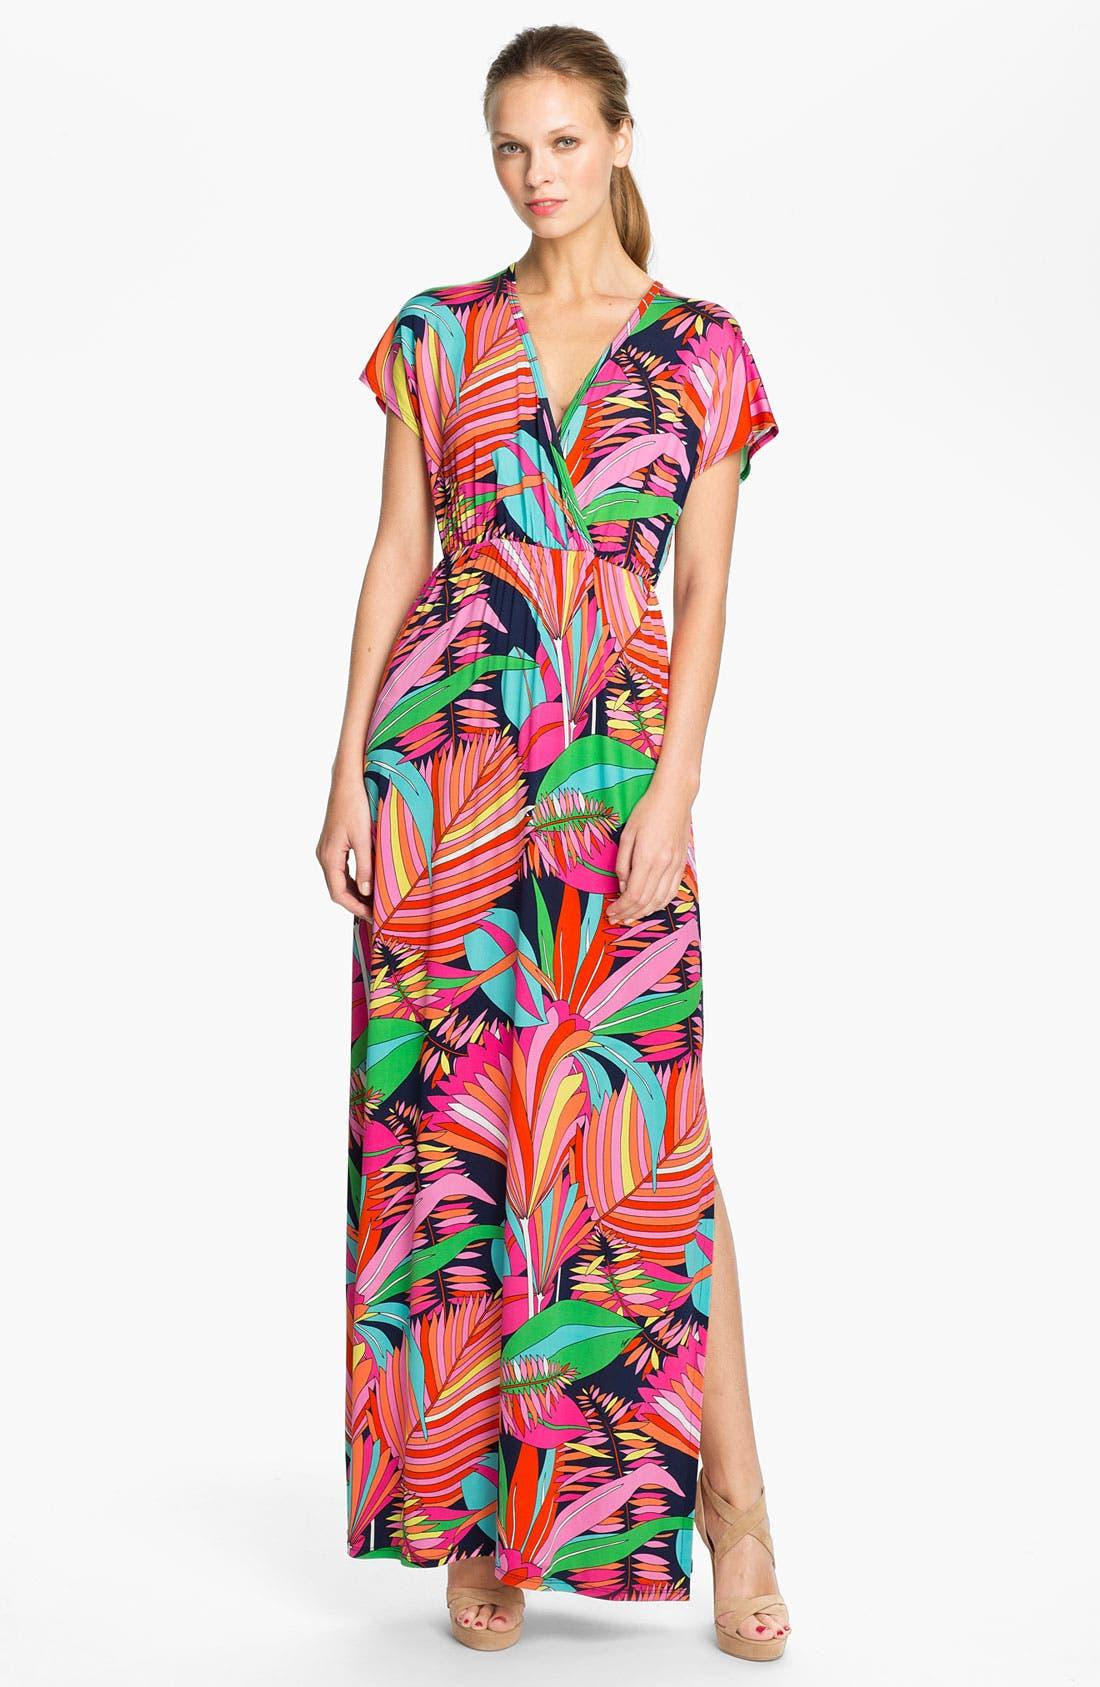 Alternate Image 1 Selected - Trina Turk 'Amrita' Print Maxi Dress